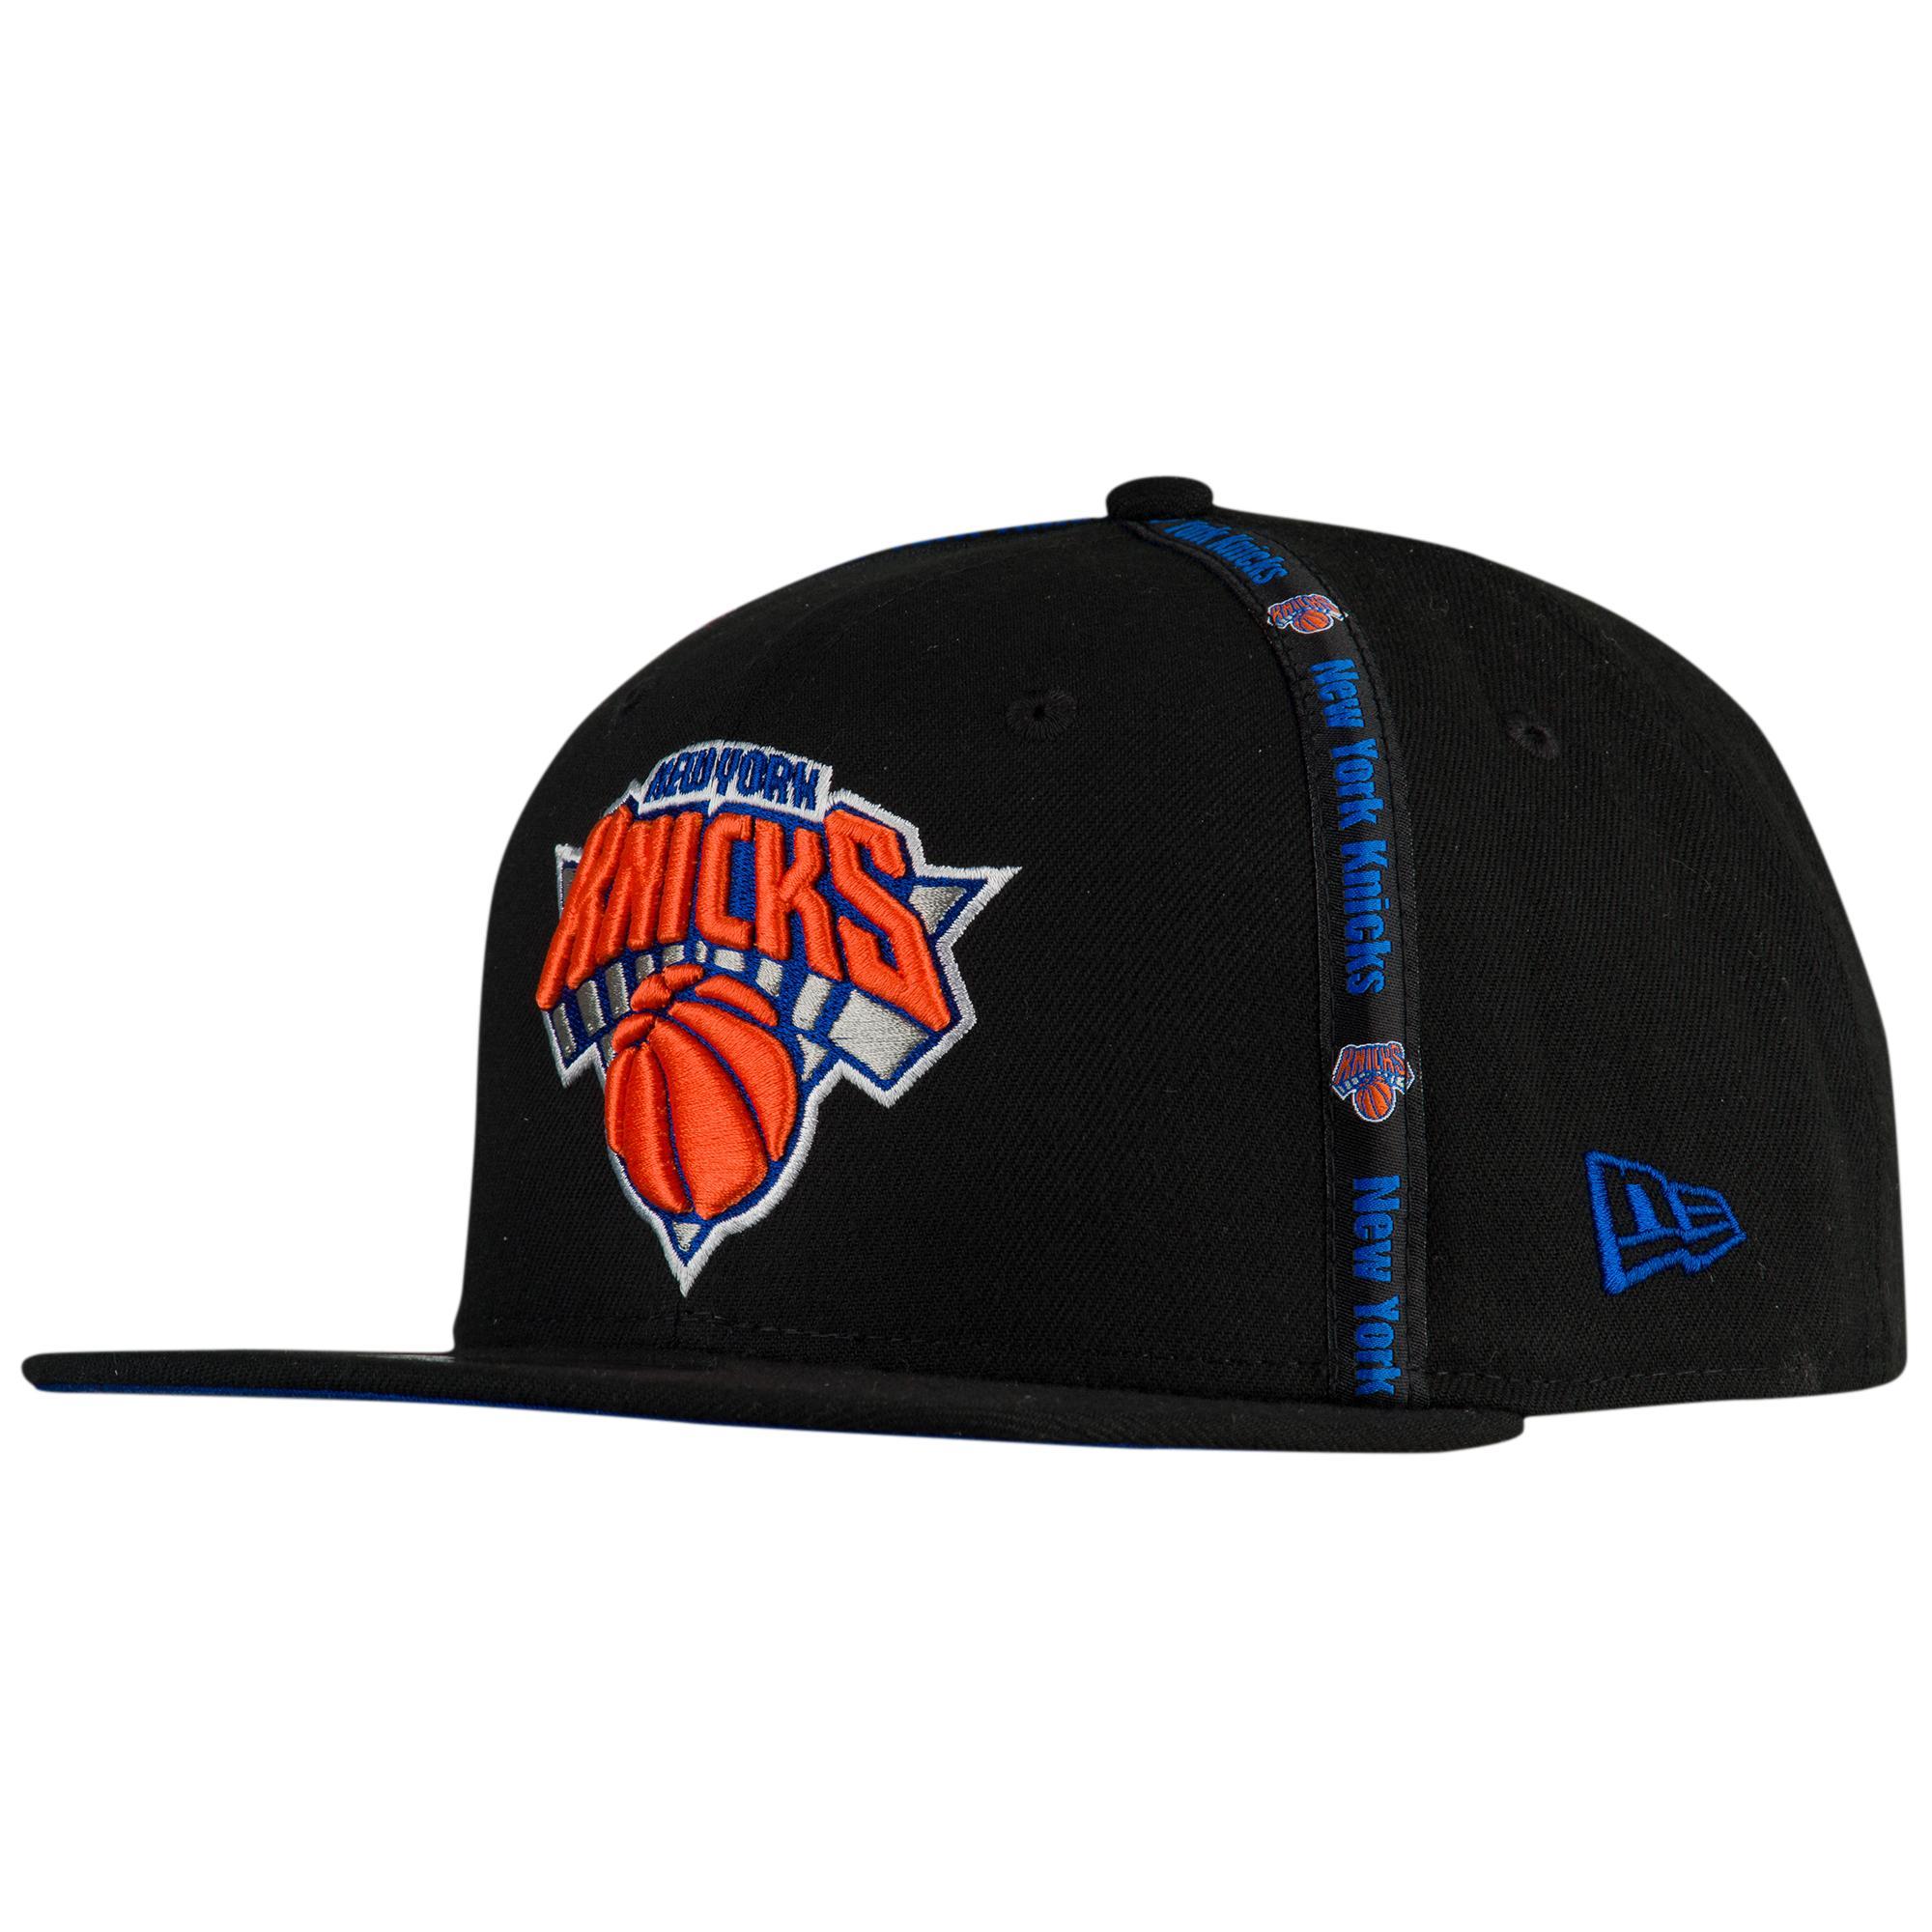 315f56f5 KTZ New York Knicks Nba Tape Snapback in Black for Men - Lyst